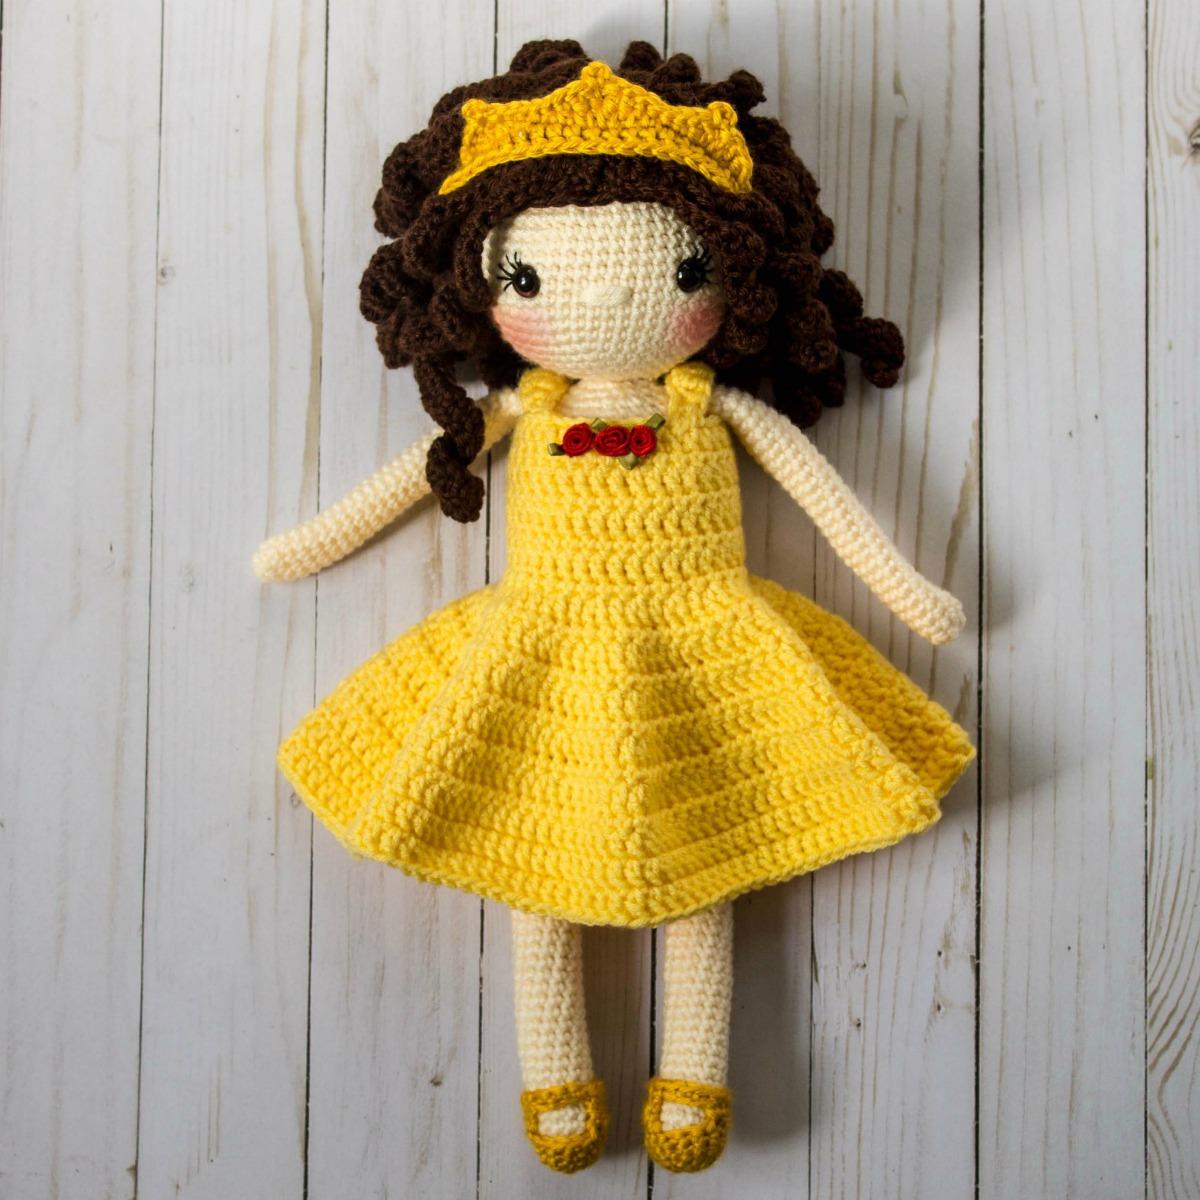 15+ Free Crocheted Doll Patterns • Free Crochet Tutorials | 1200x1200